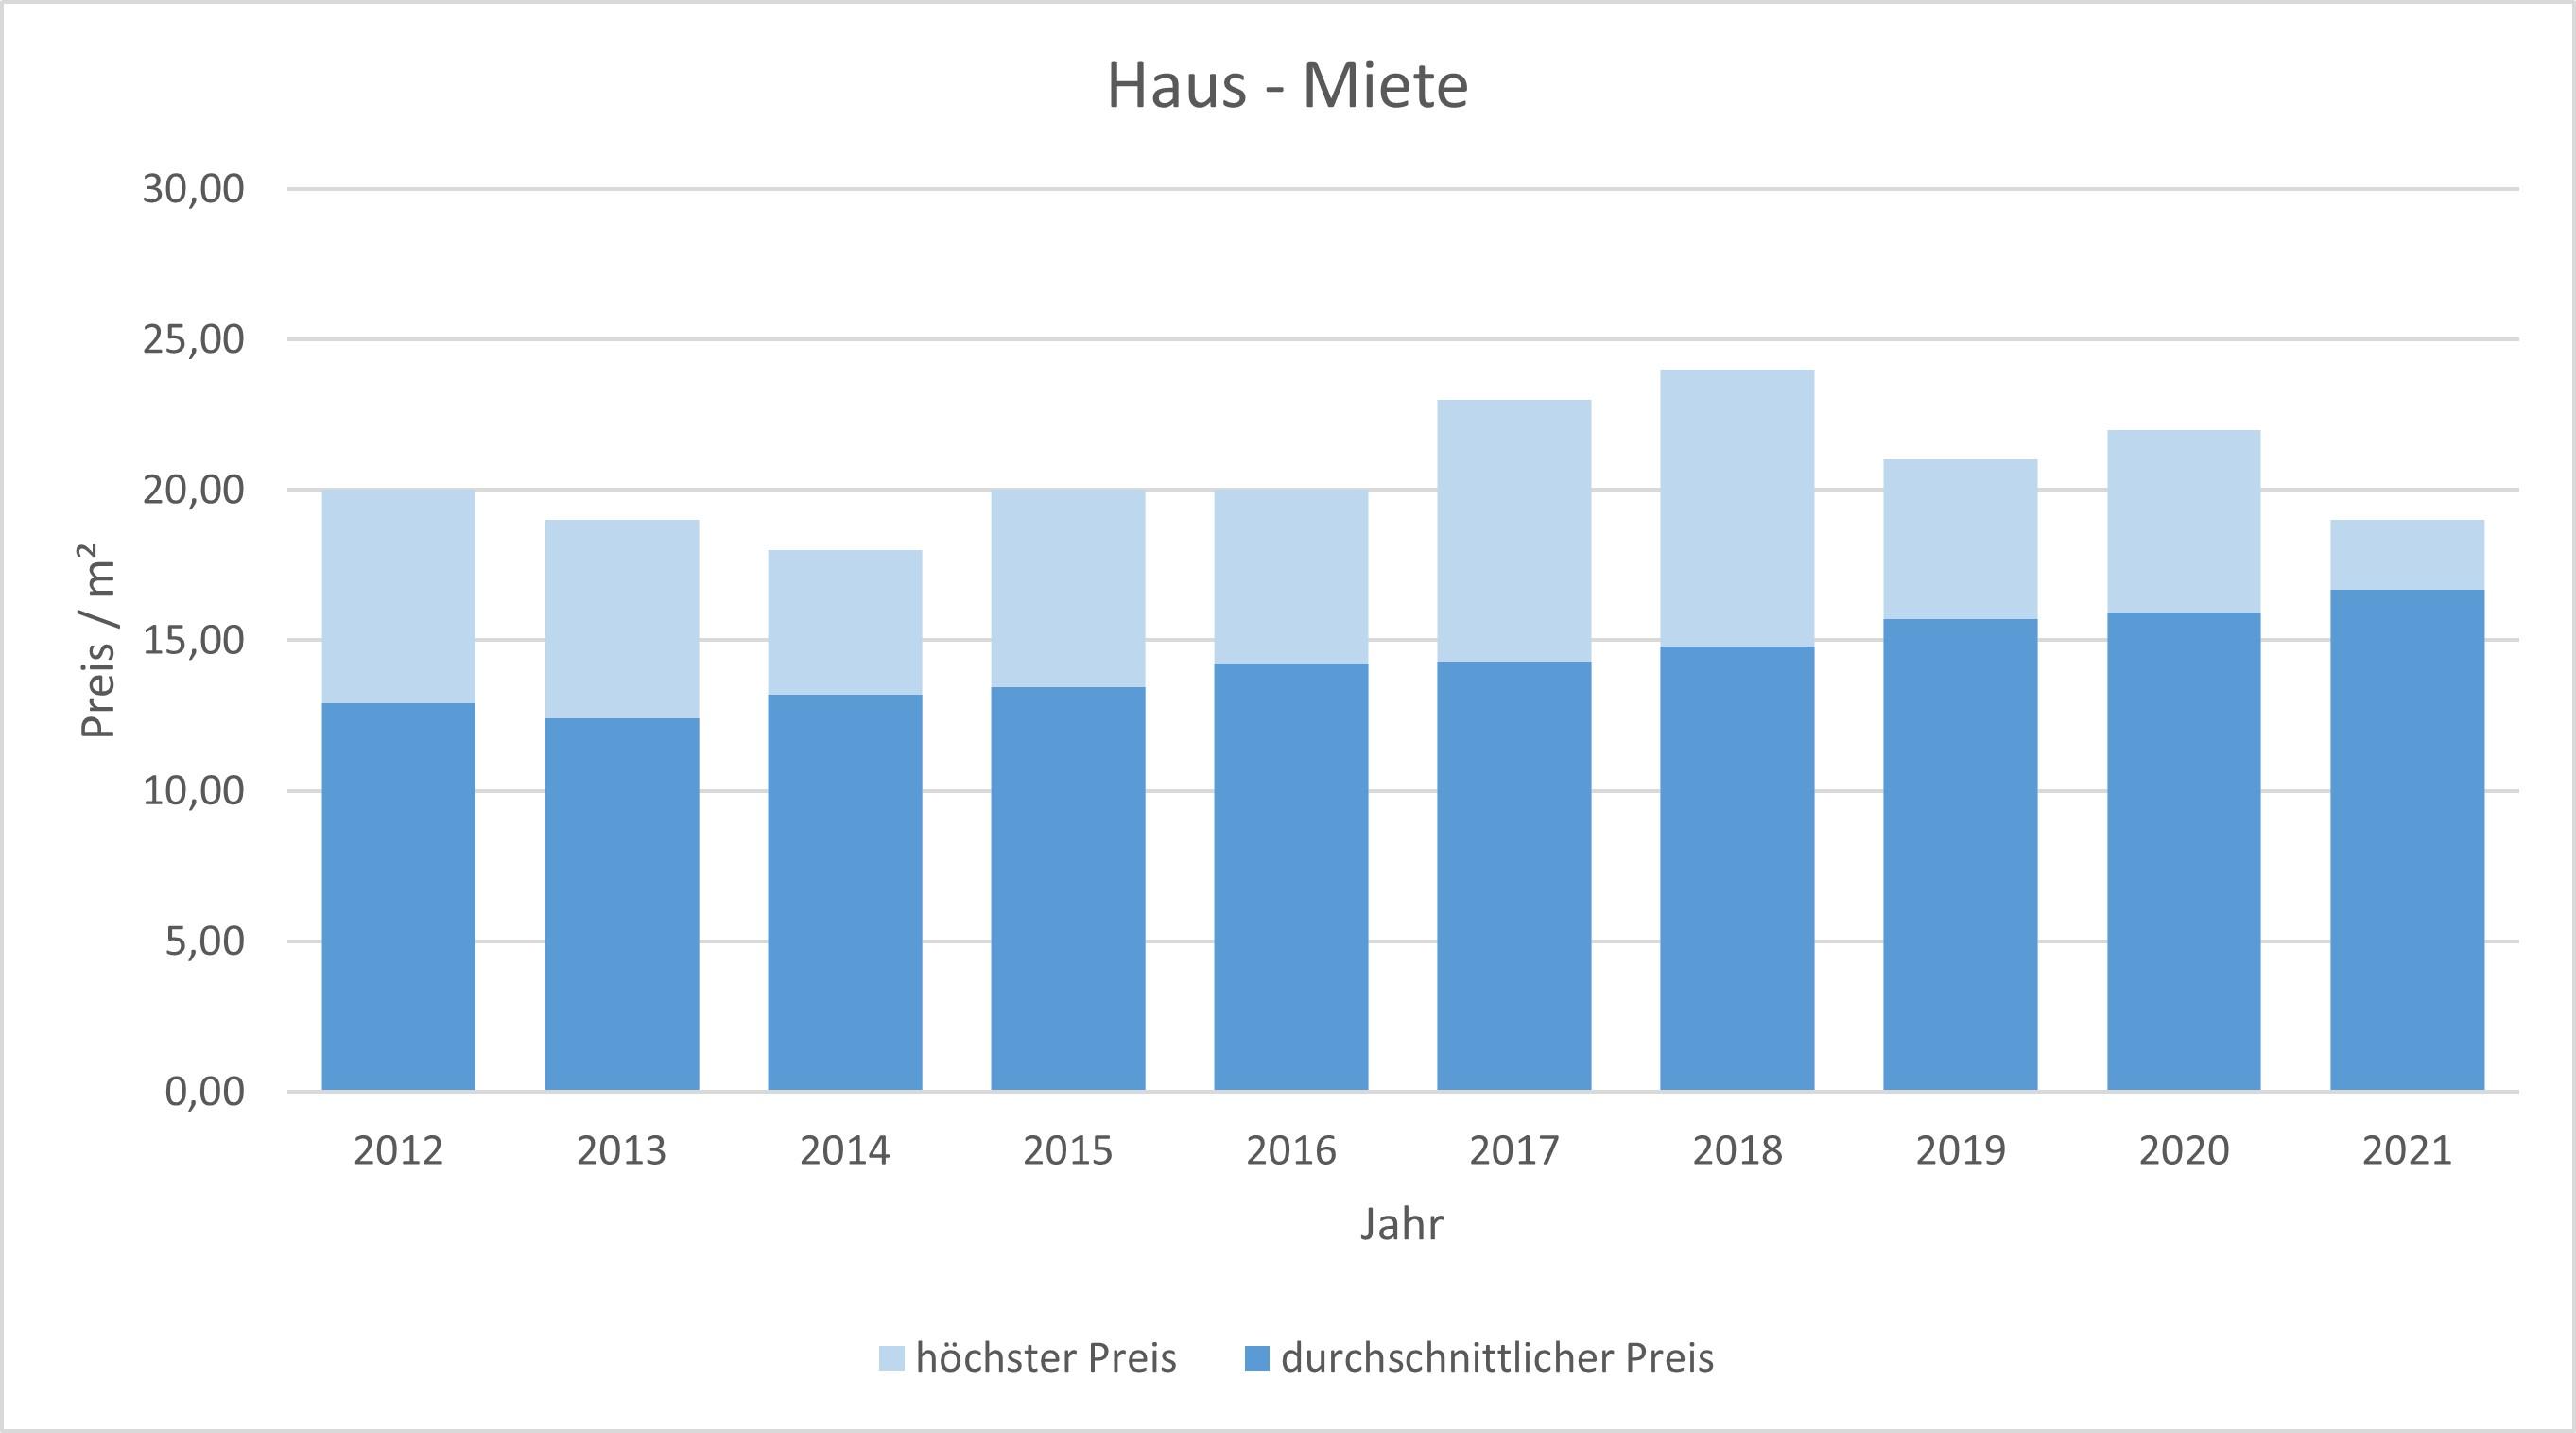 Ottobrunn Haus  mieten vermietenPreis Bewertung Makler www.happy-immo.de 2019 2020 2021